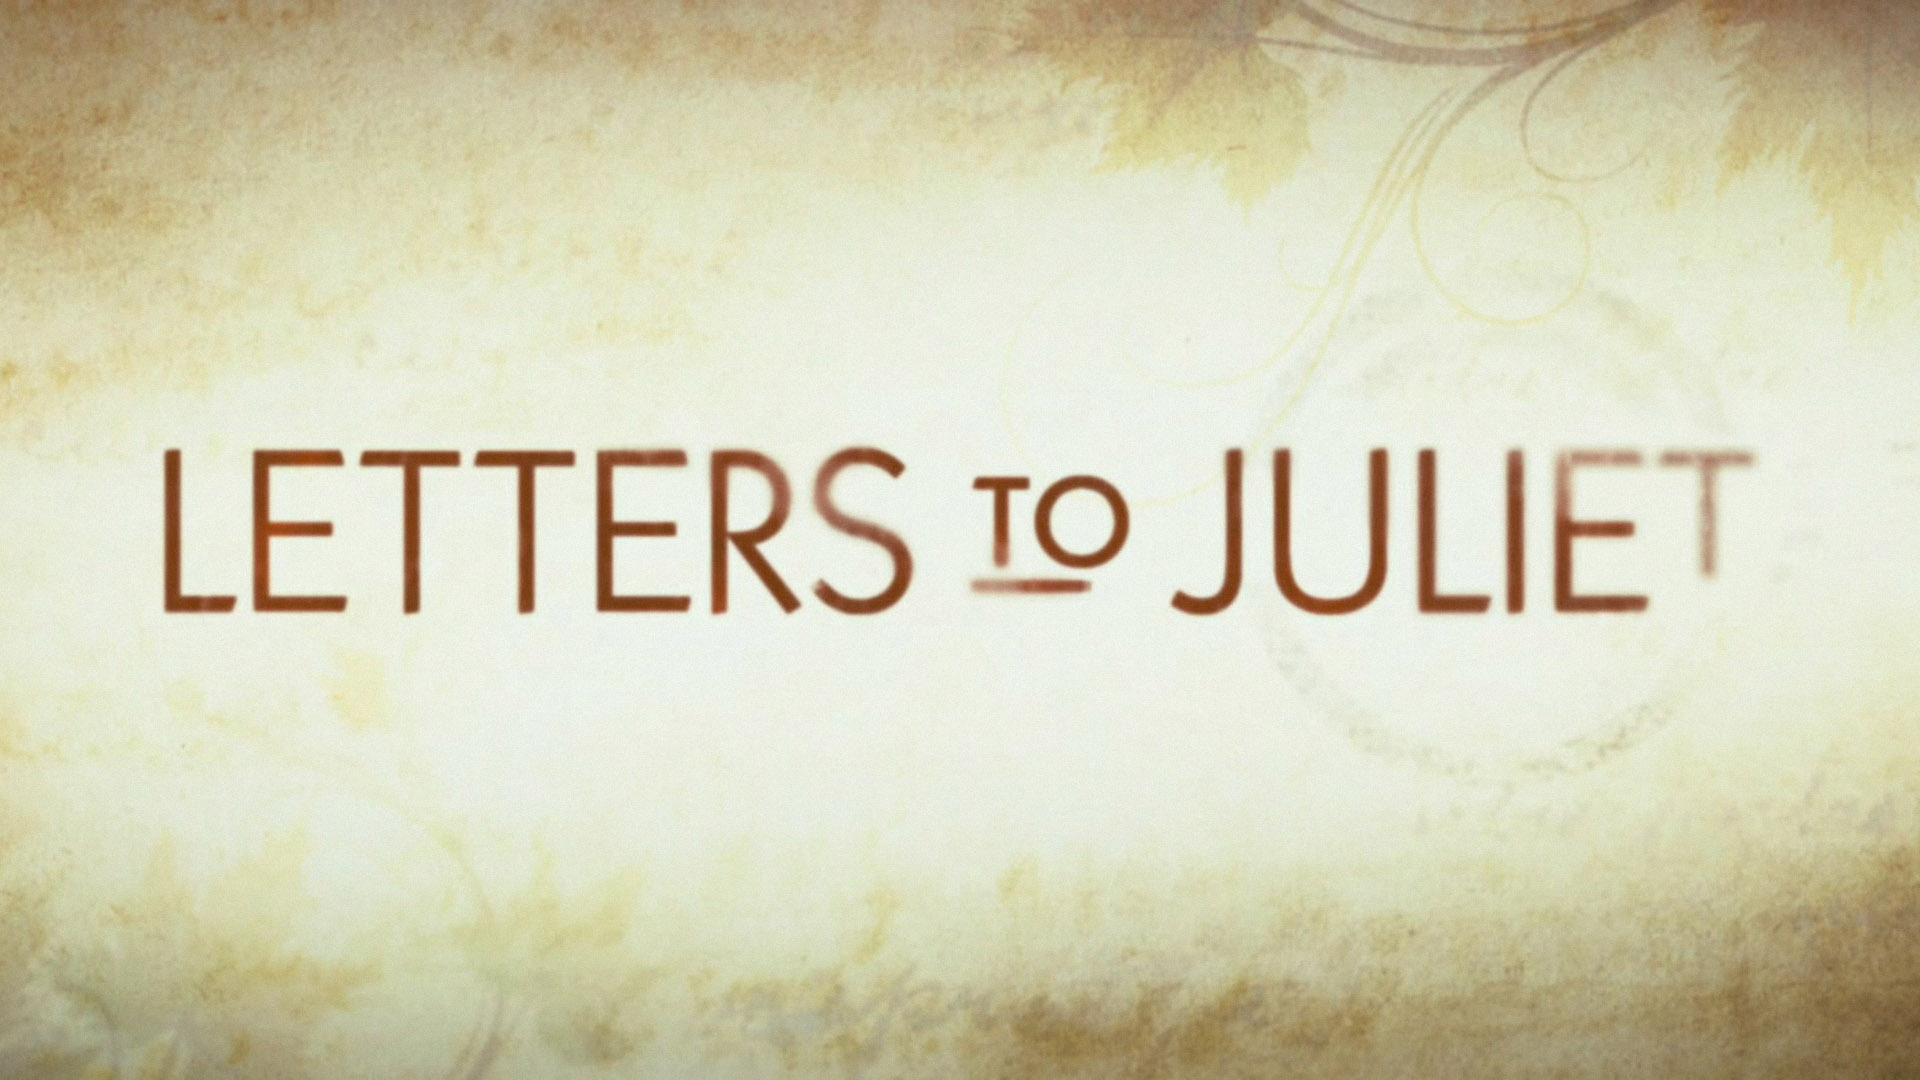 Letters Wallpaper Letter to juliet wallpaper 1920x1080